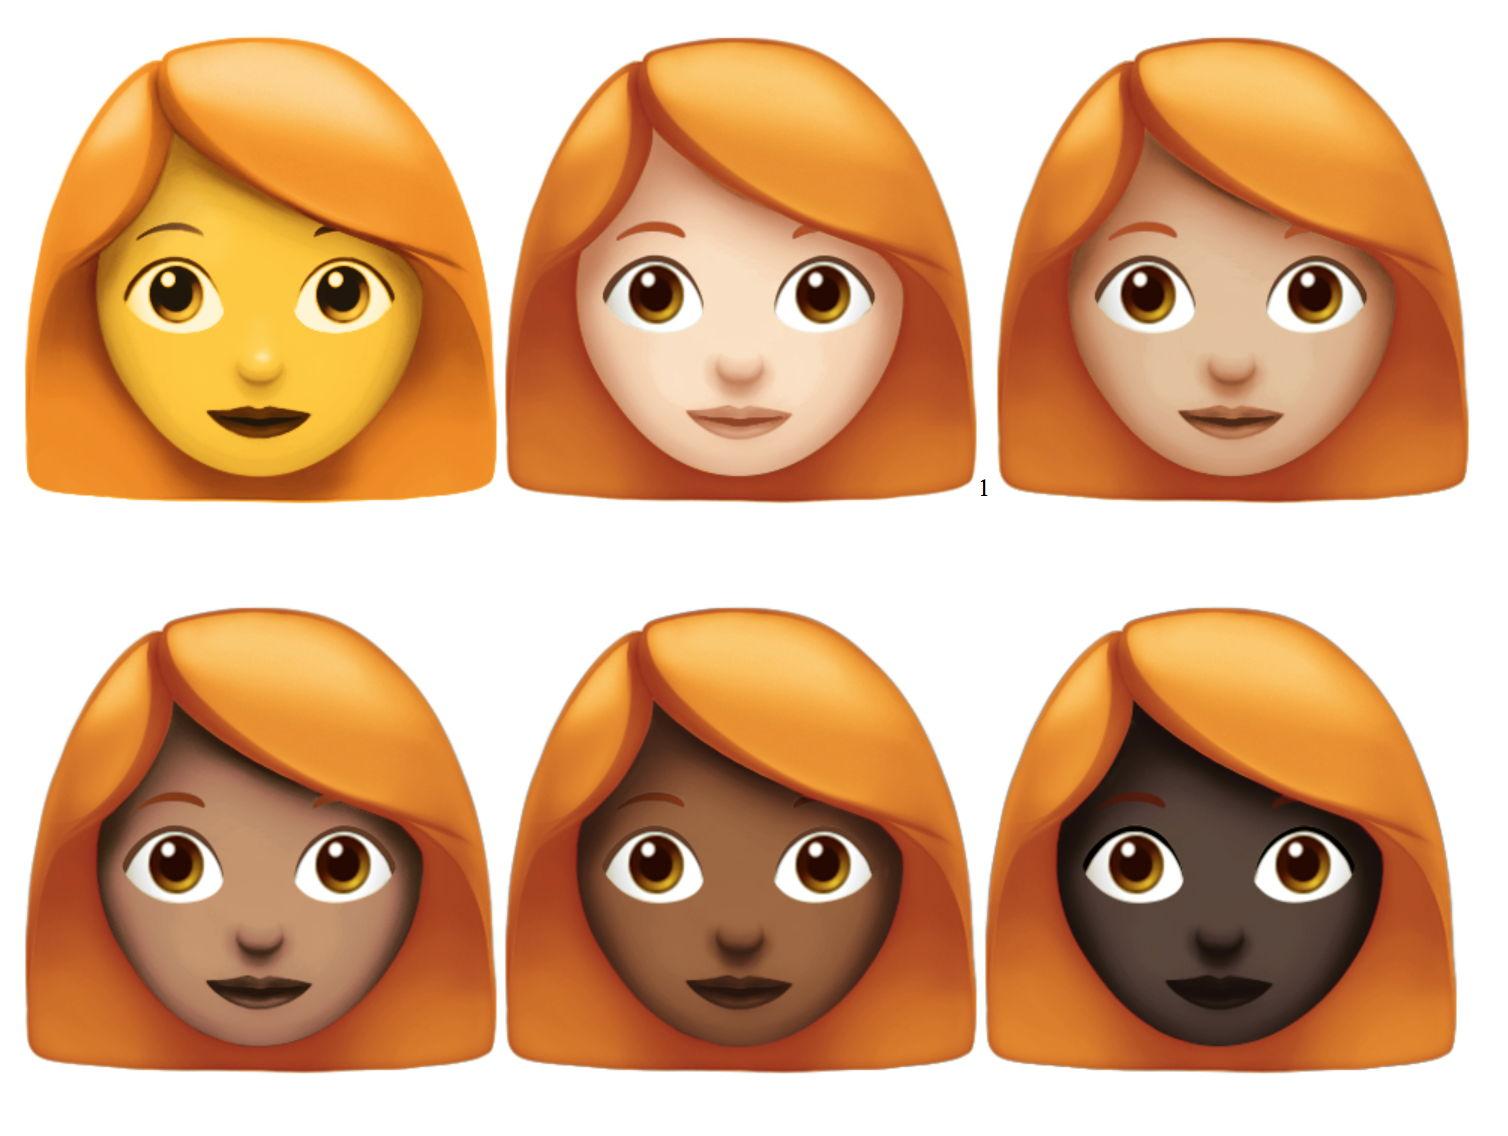 Apple previews new emoji coming in iOS 12 - iPhone J D